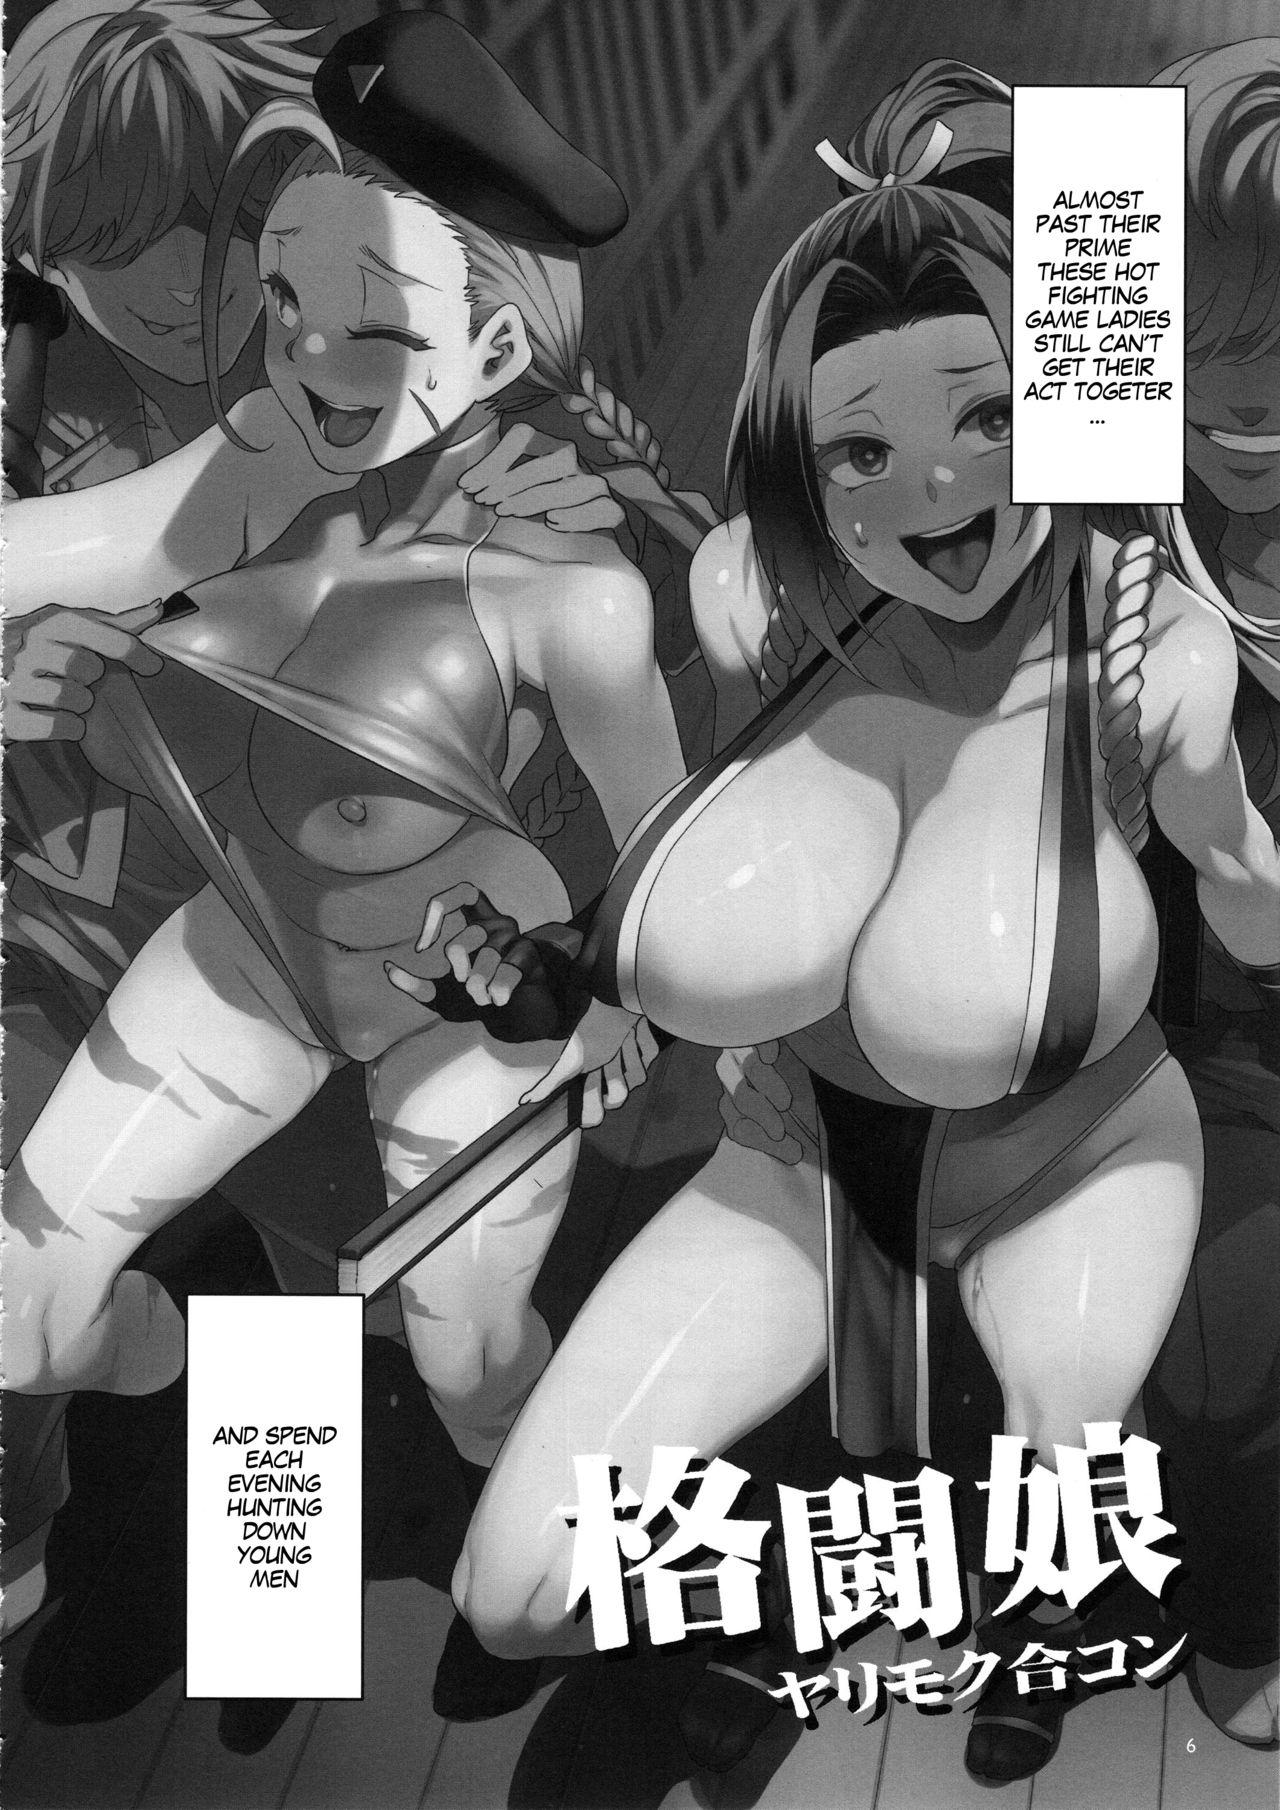 Kakutou Musume Yarimoku Goukon | Casual Sex Party With Fighting Game Gals 4